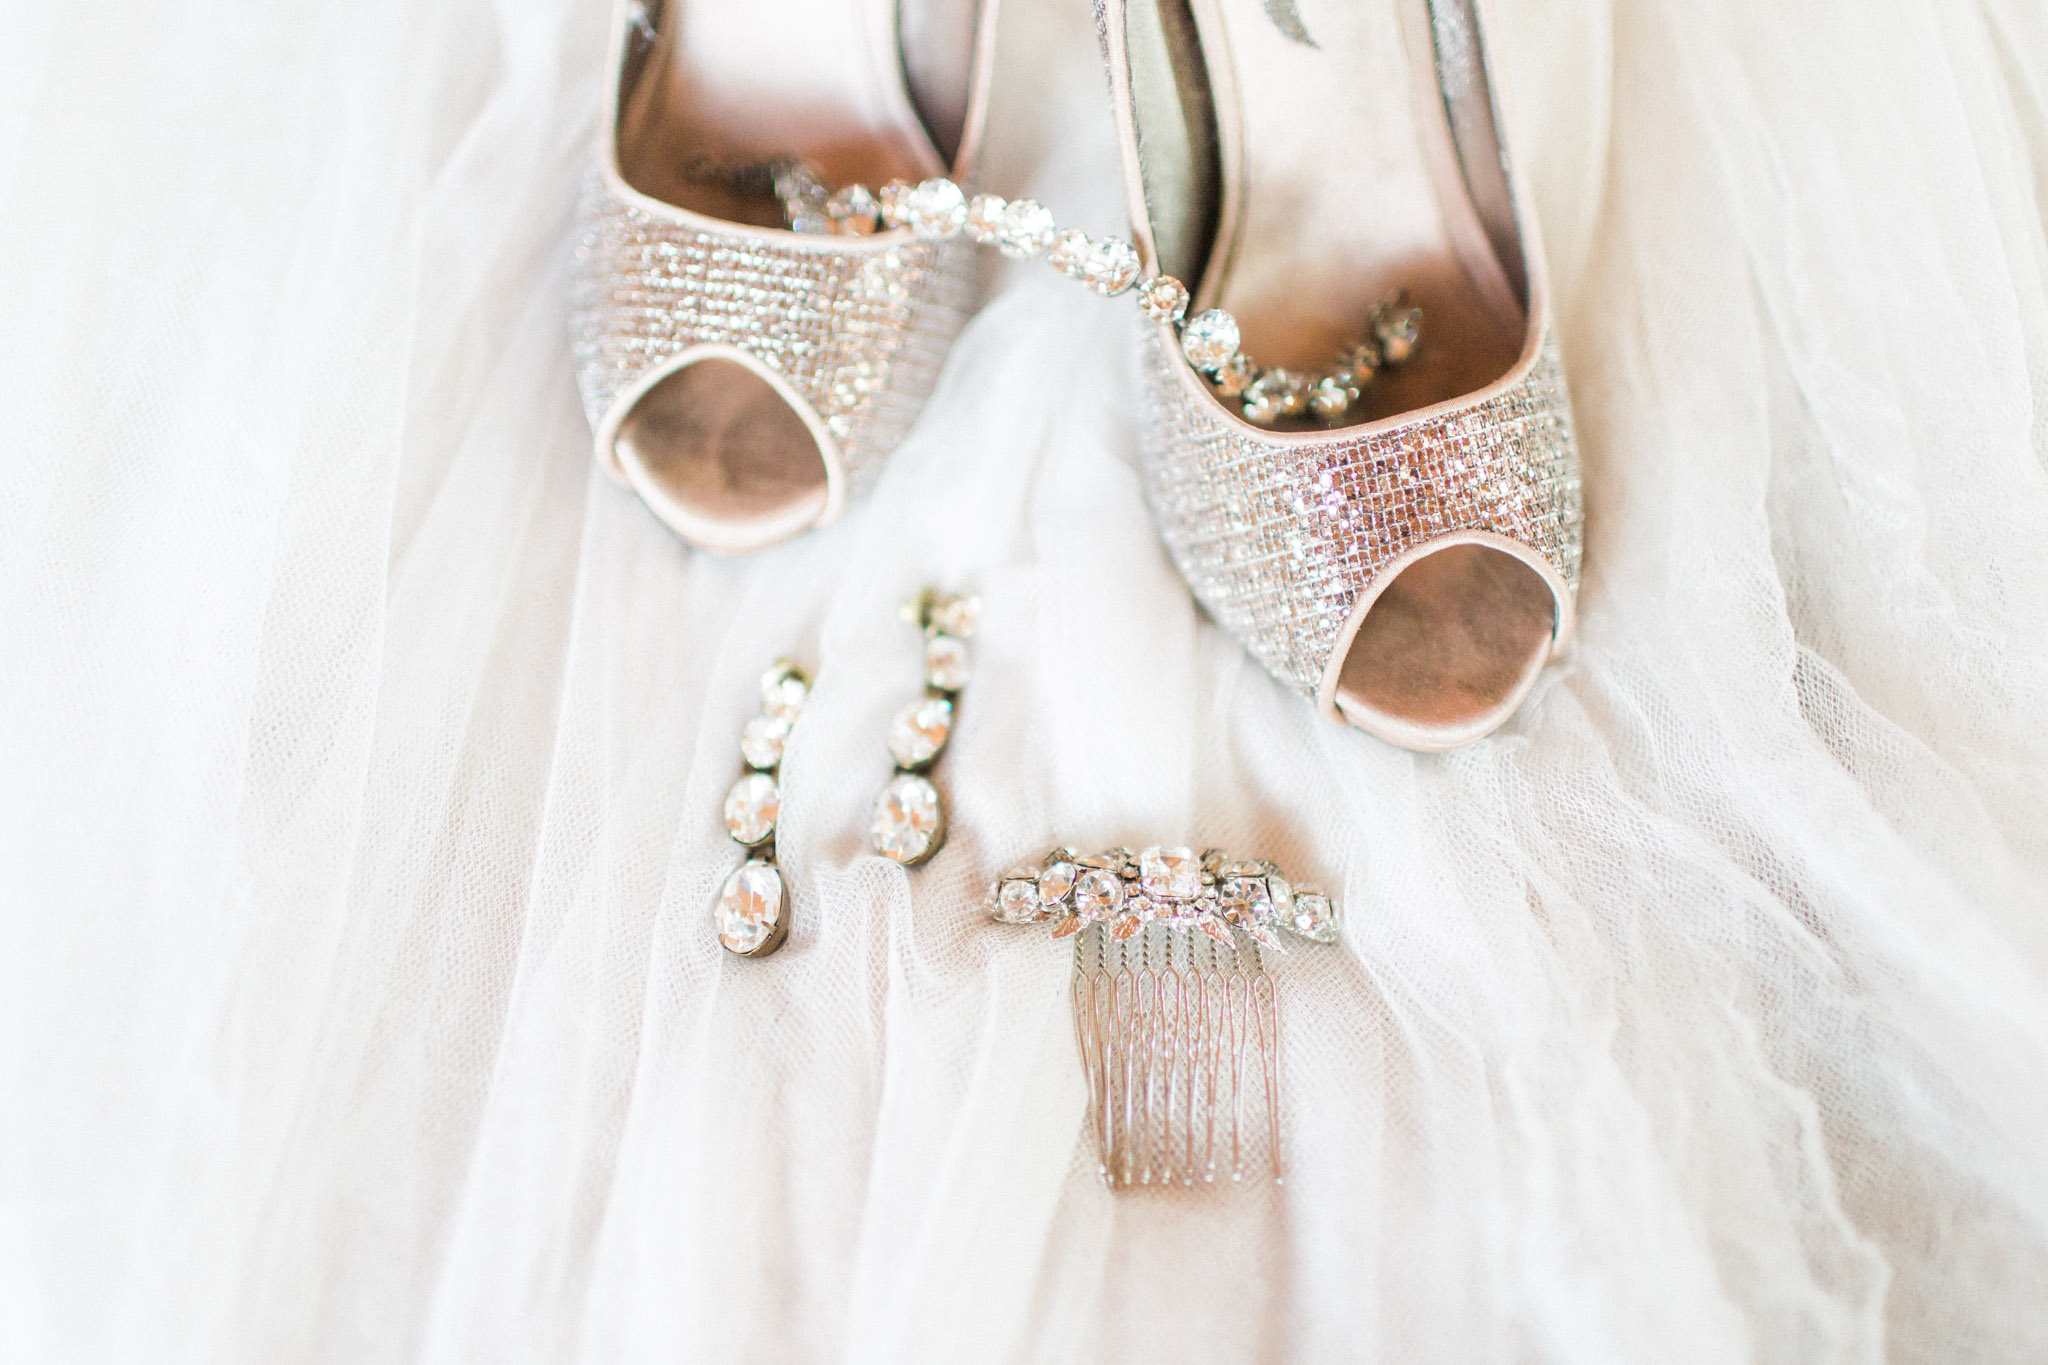 TheBigFakeWedding_DFW_wedding_photographer-8.jpg